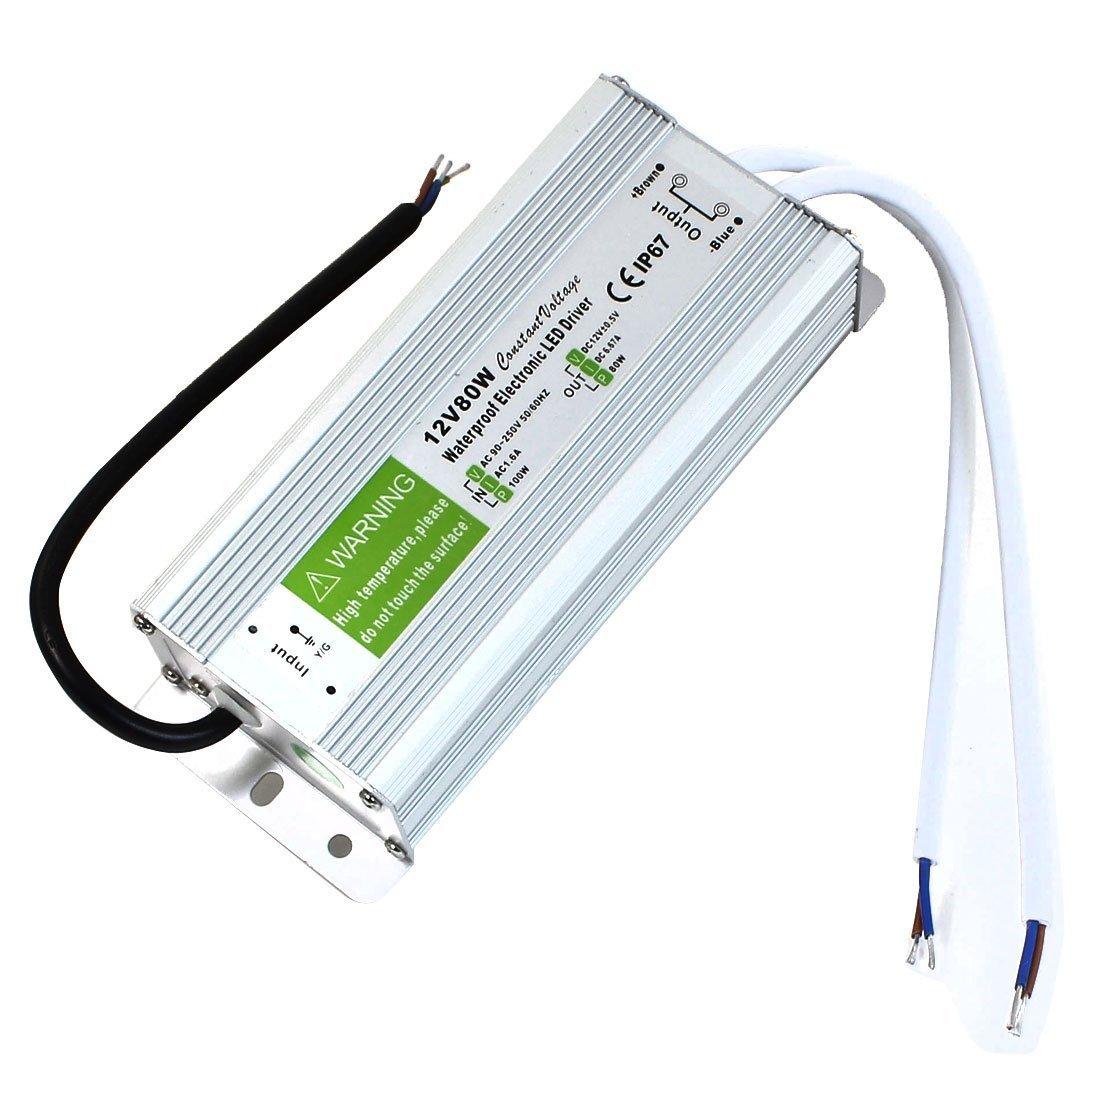 JOYLIT 80W Waterproof Superior Quality Aluminum Alloy LED Power Supply Driver LED Transformer 110-240V to 12V DC Output